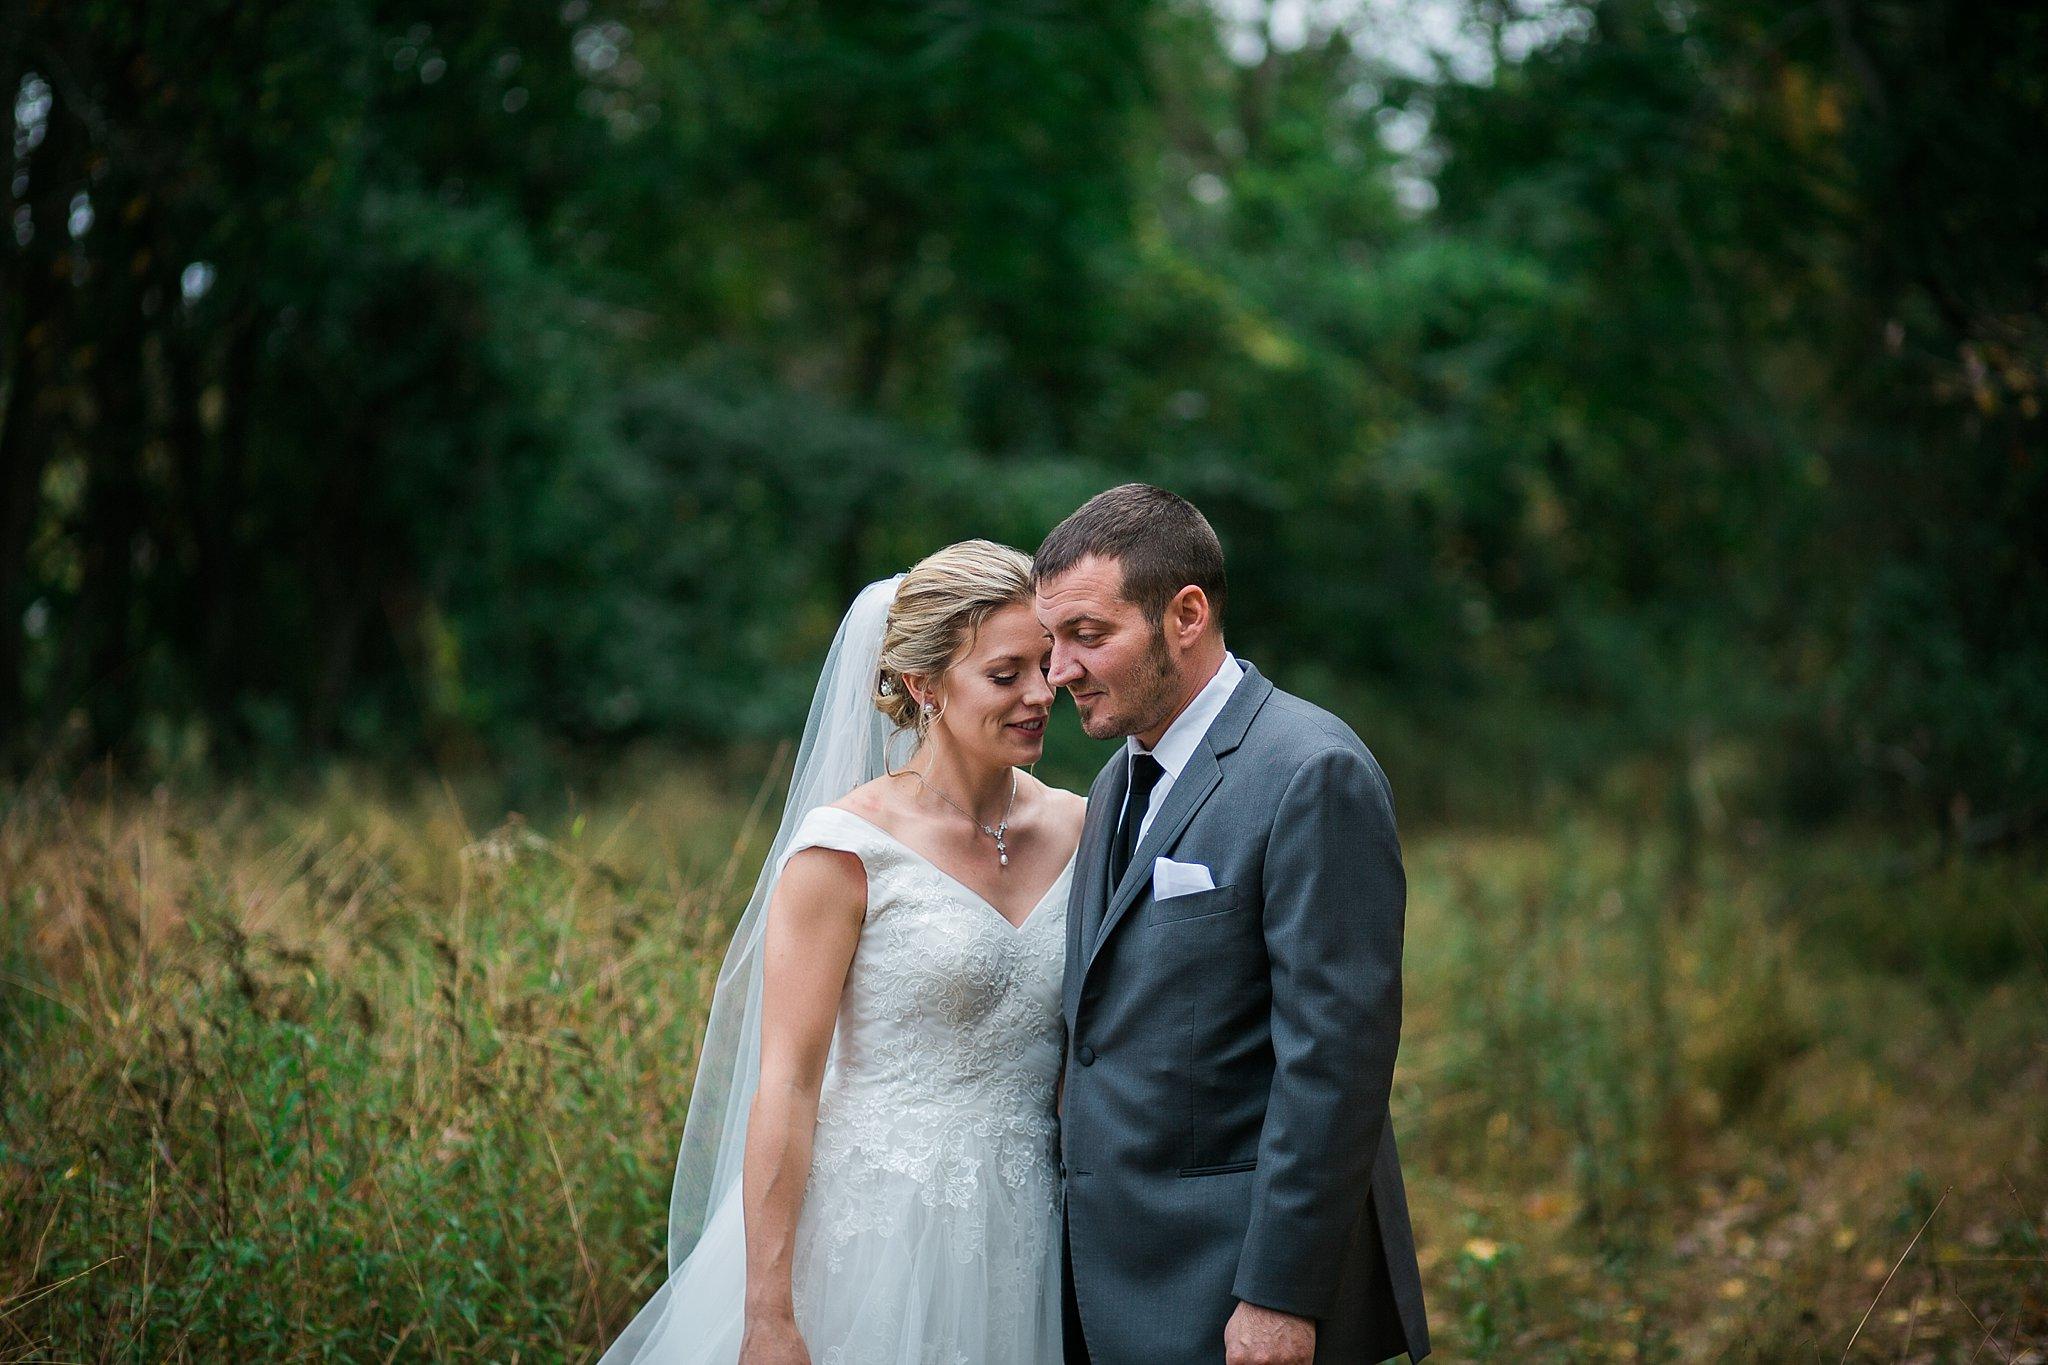 New Windsor New York Hudson Valley New York Wedding Photographer 30.jpg